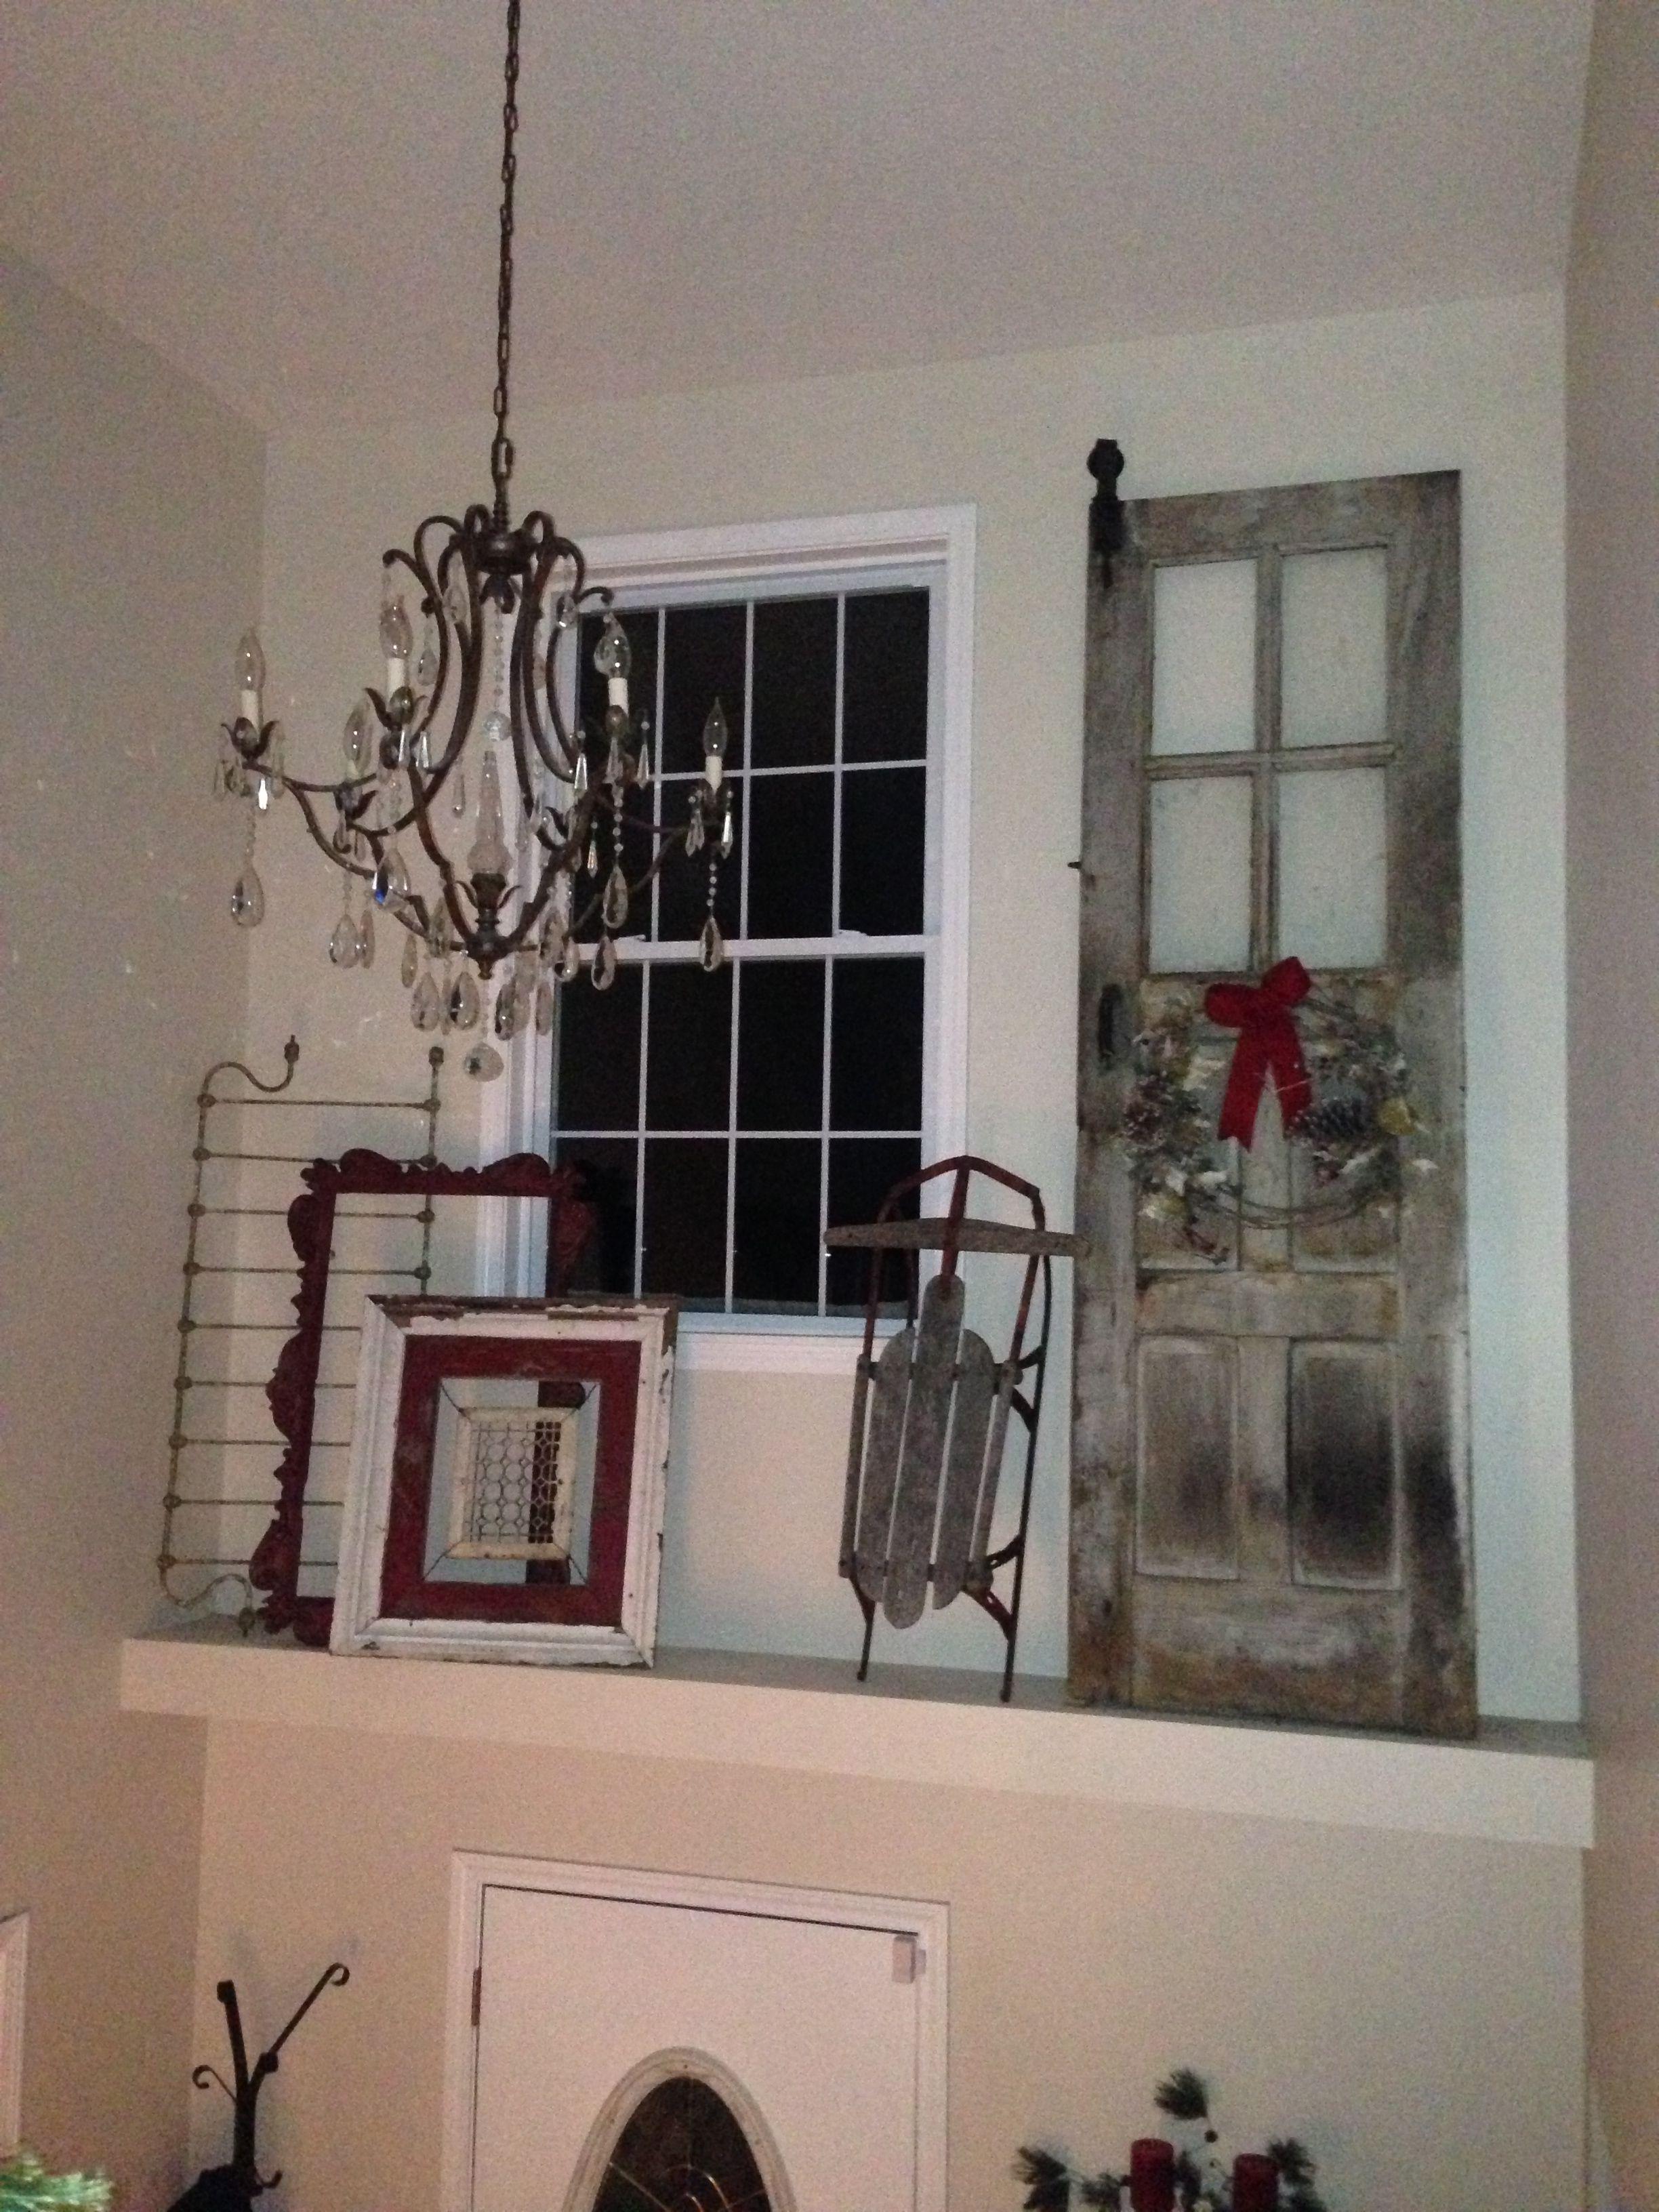 Pin By Bill Schneider On Christmas Ledge Decor Above Door Decor